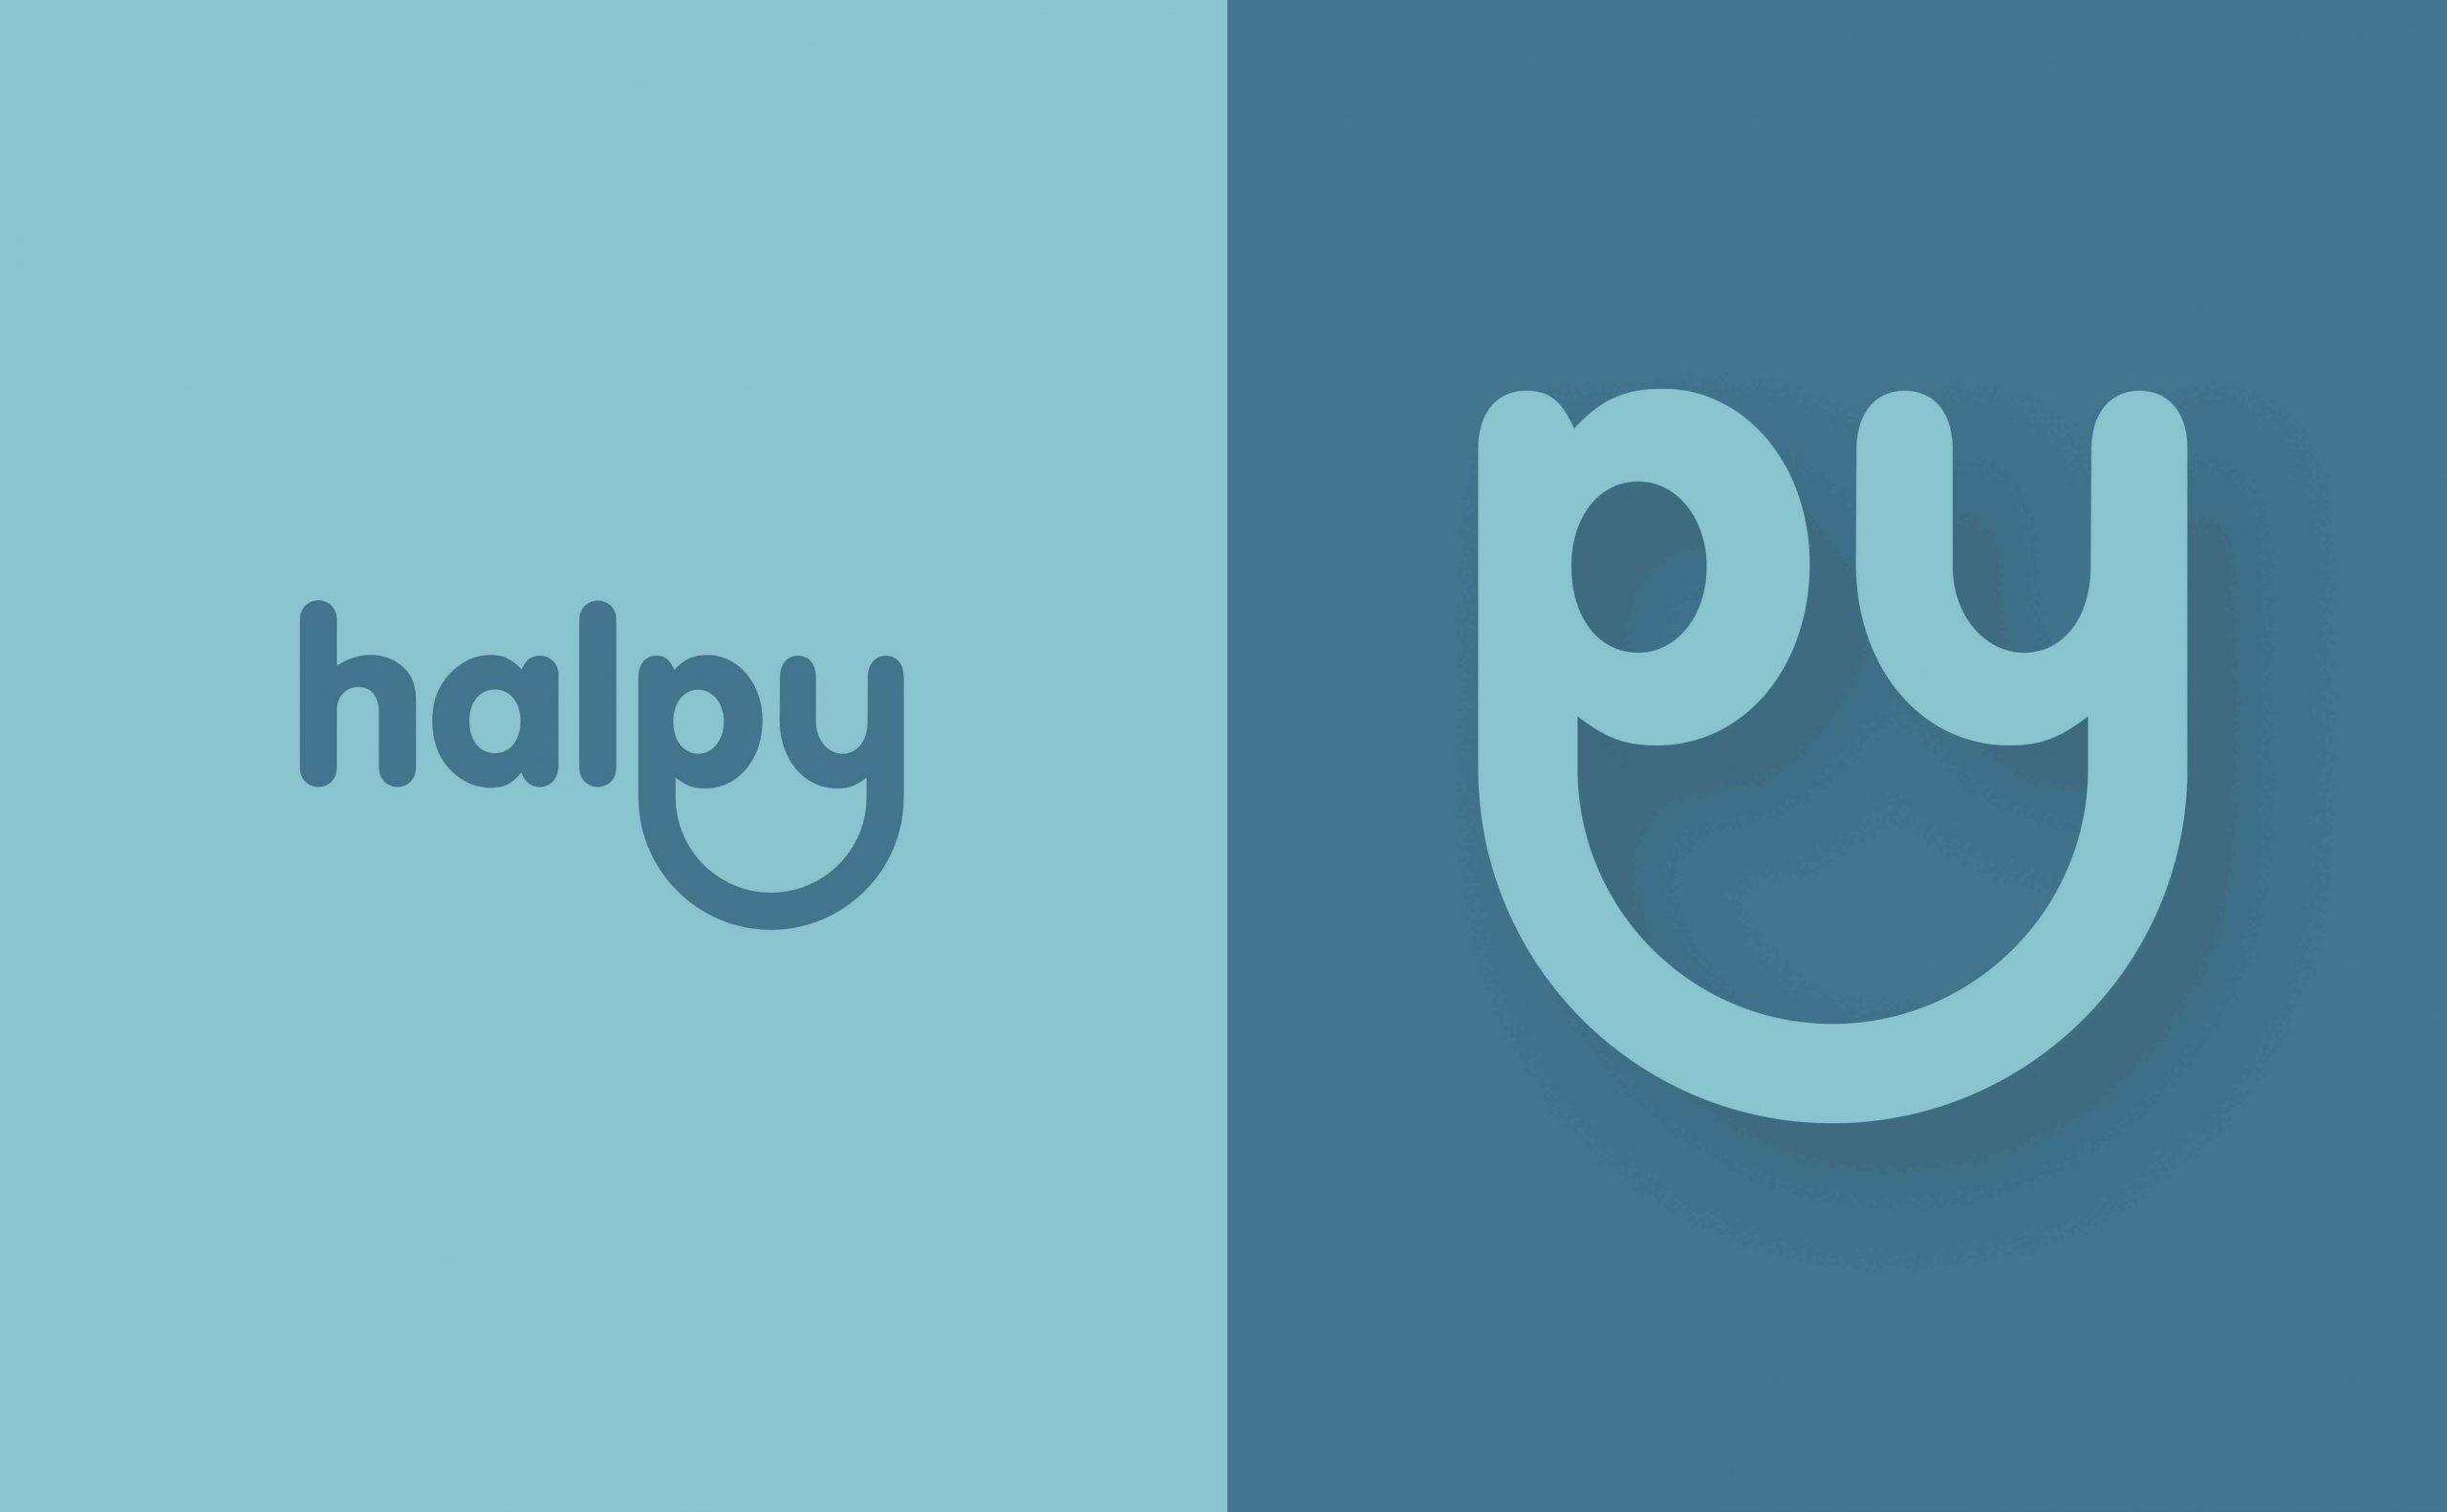 halpy-logodesign-design-low